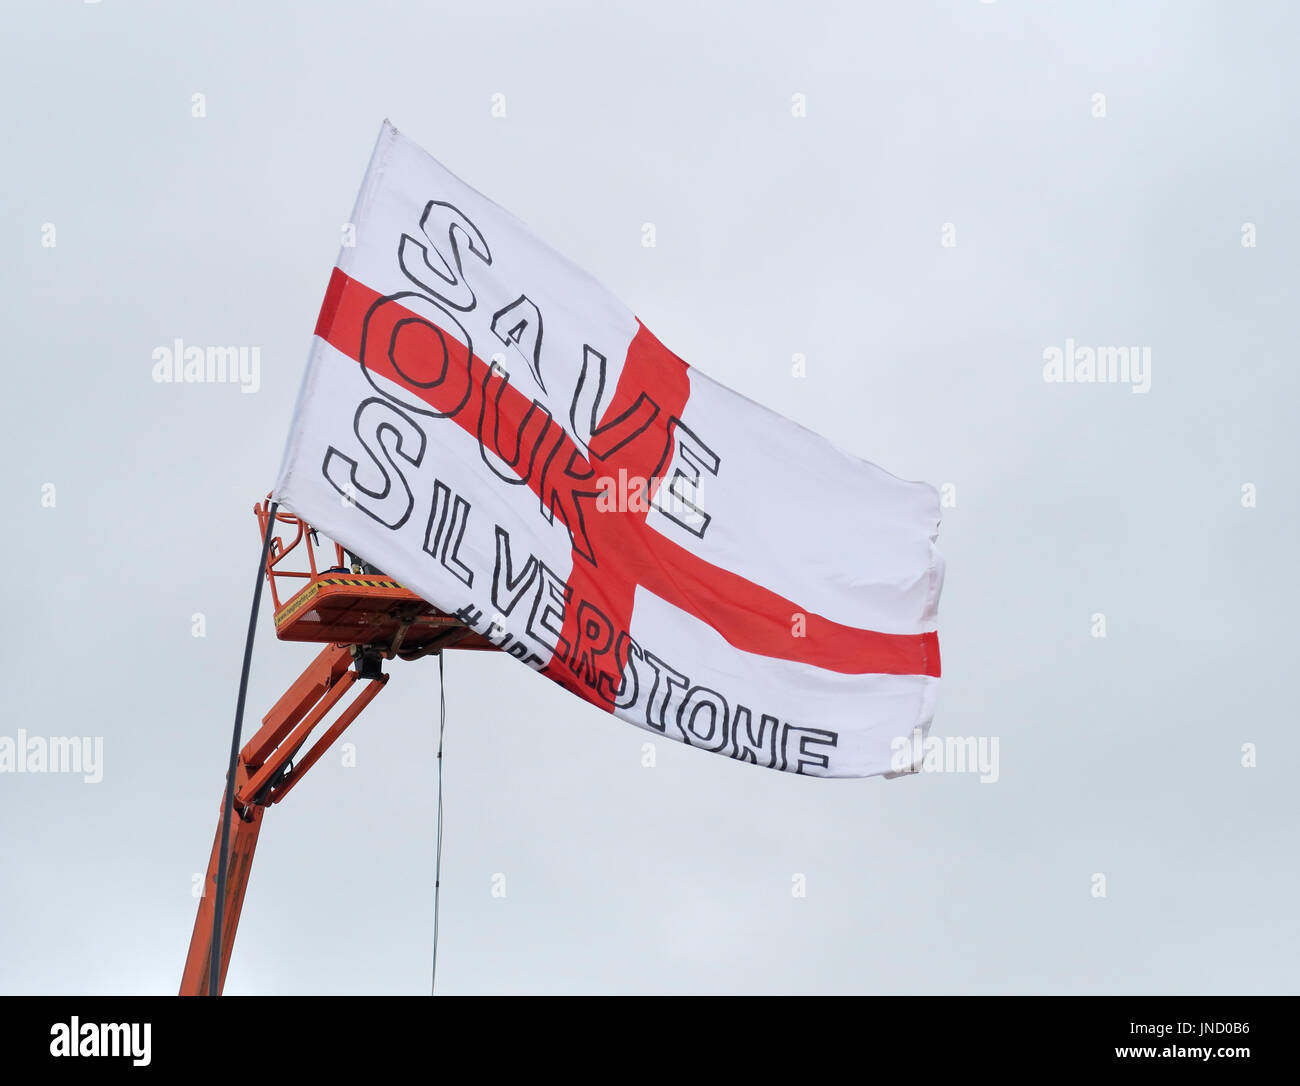 F1,Circuit,July,2017,Our,to,keep,grand,prix,GoTonySmith,England,English,flag,St